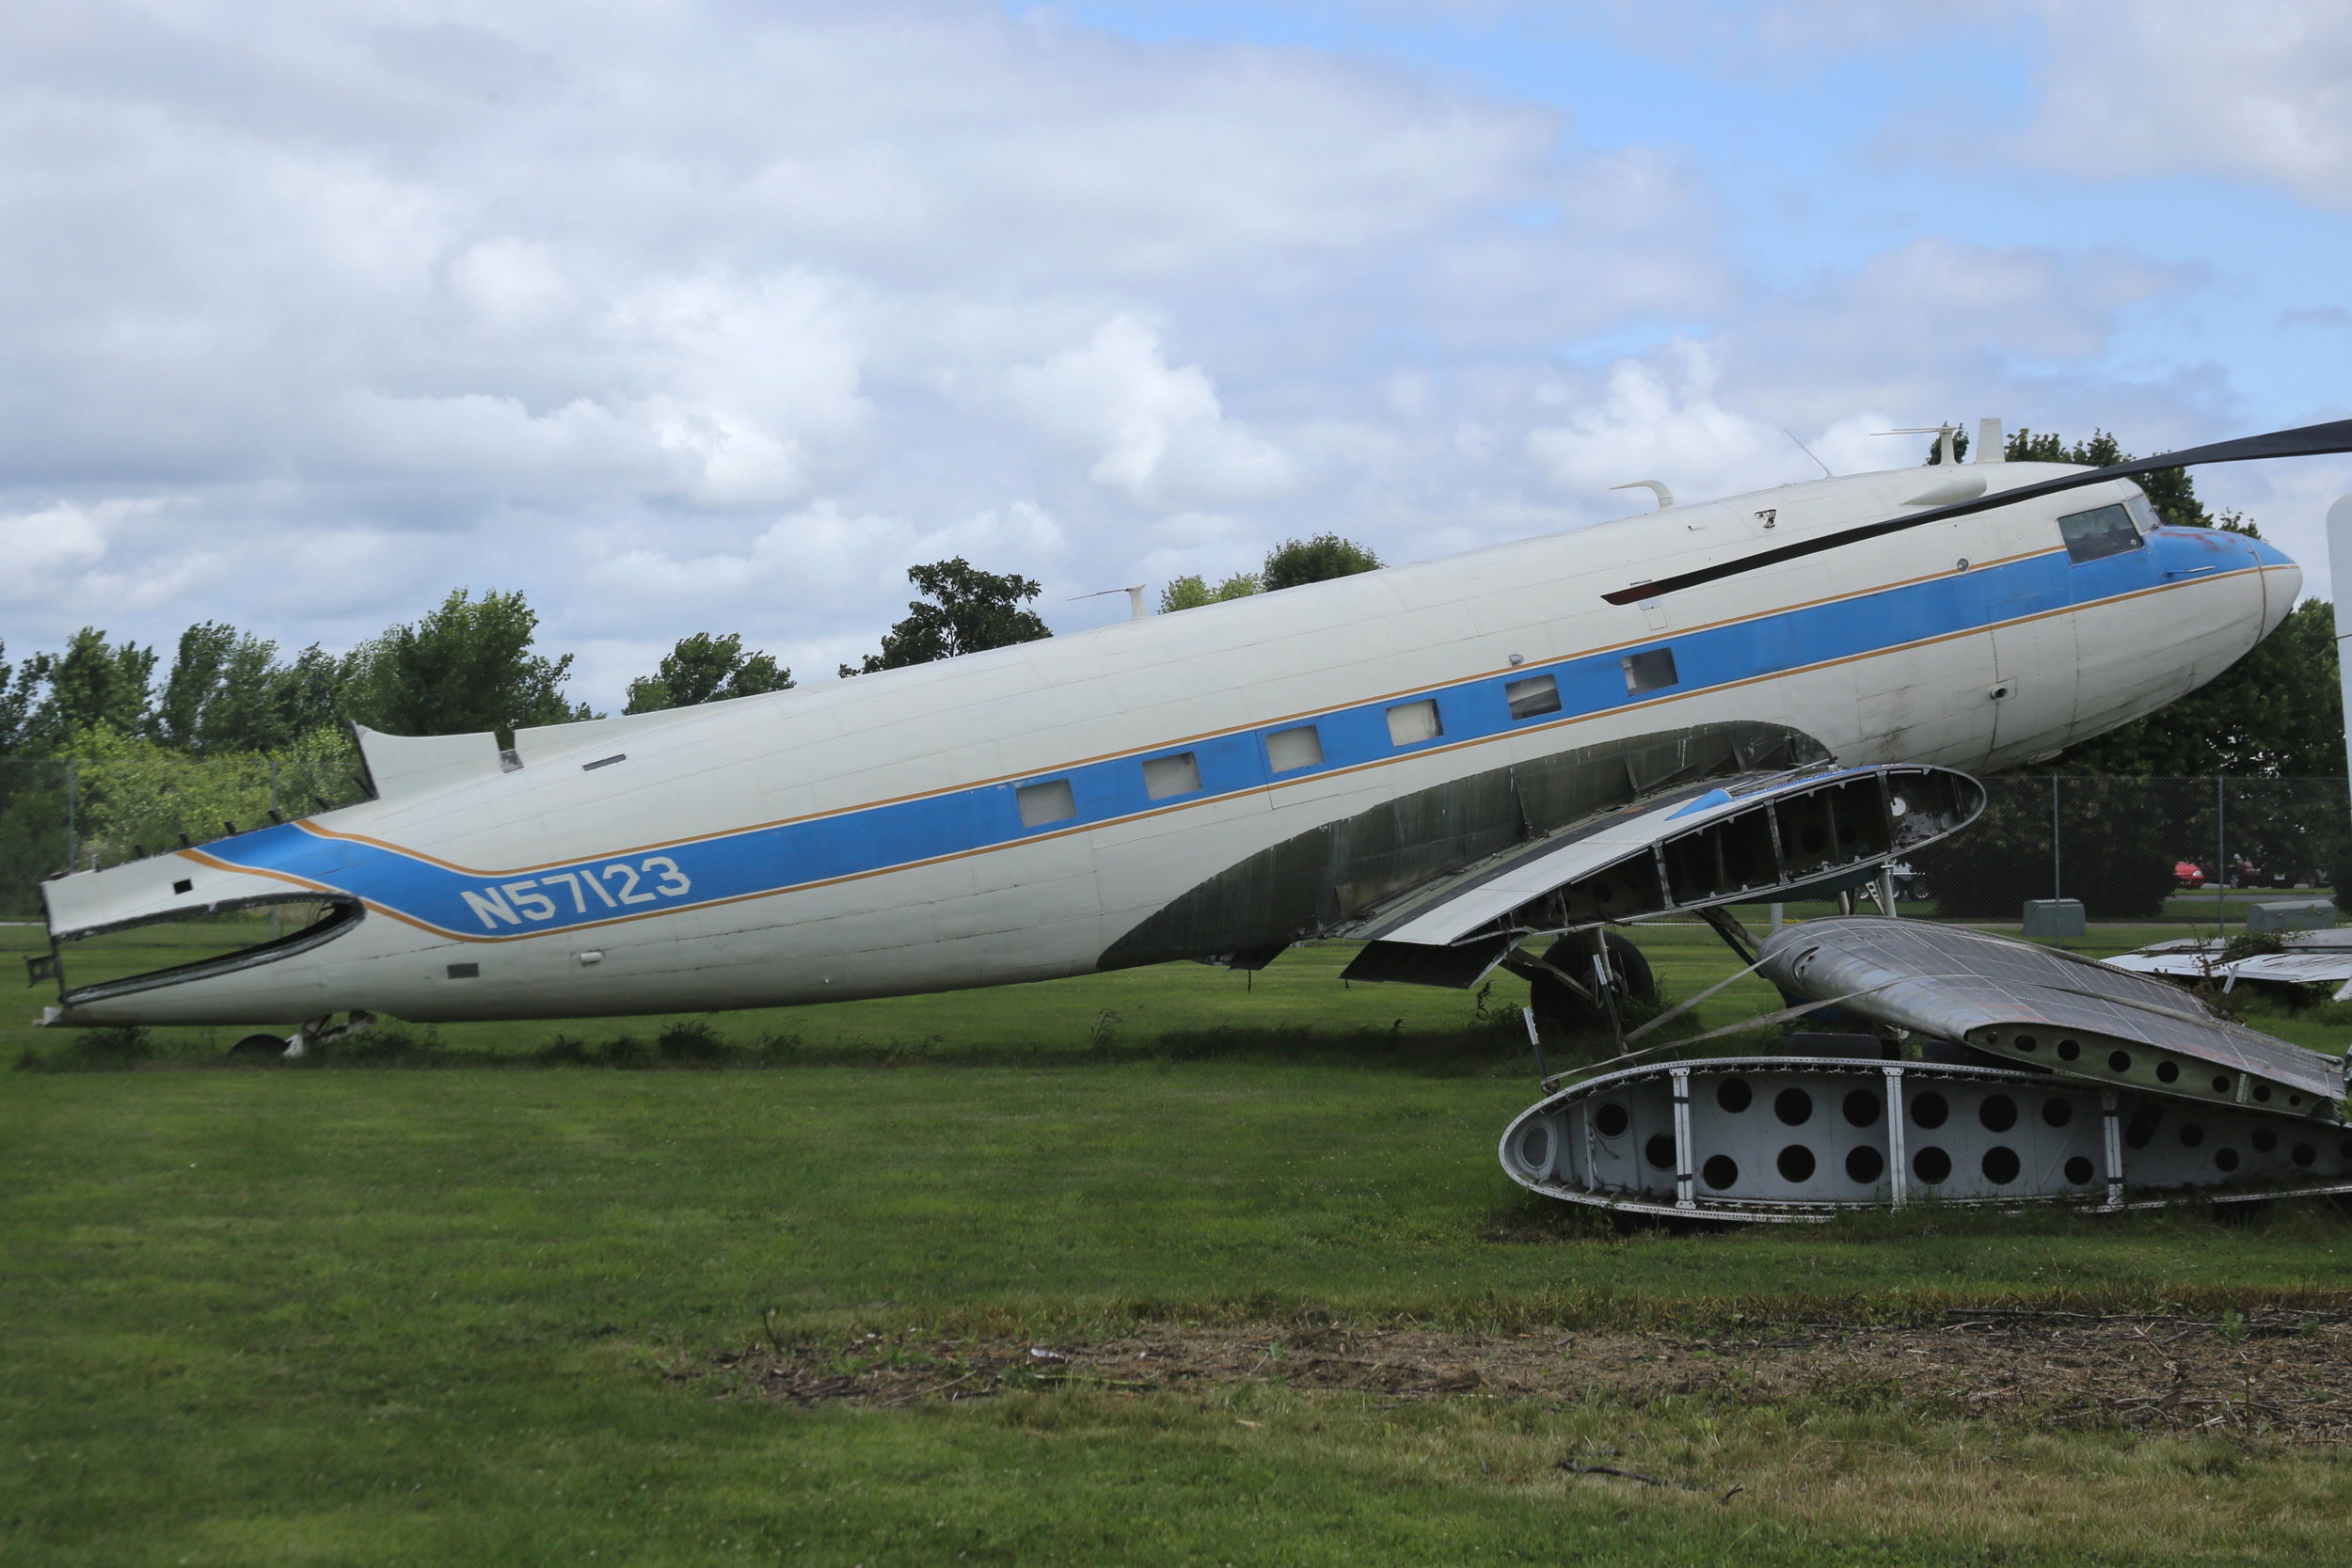 N57123 Ex Aviation Enterprises DC3 taken at Basler Turbo Conversions 26th July 2018 by John Wood